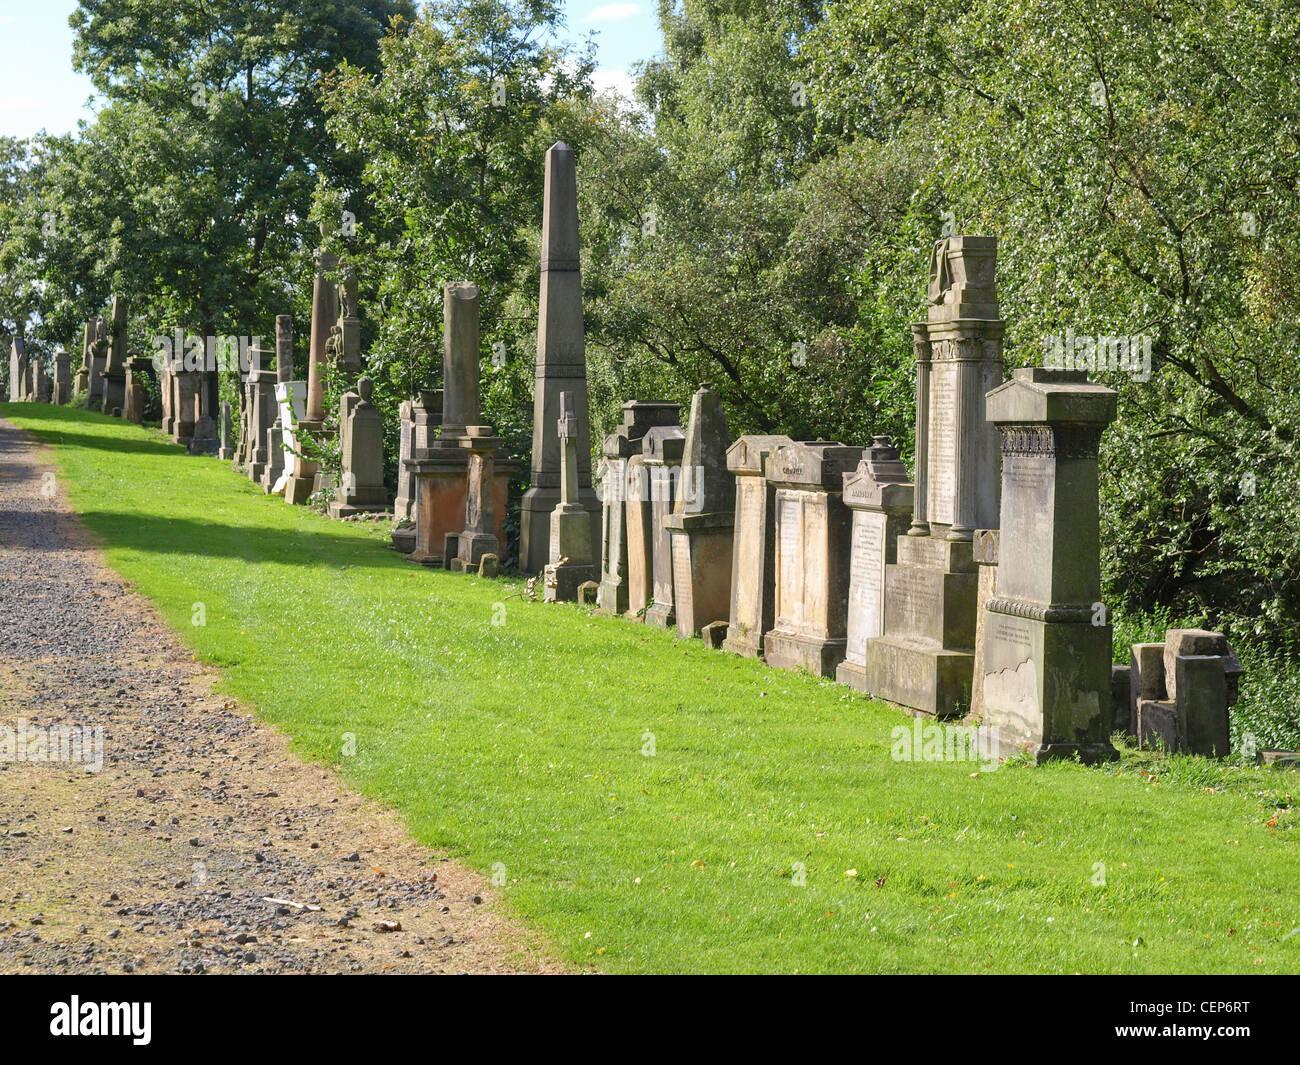 The Glasgow necropolis, Victorian gothic garden cemetery in Scotland Stock Photo